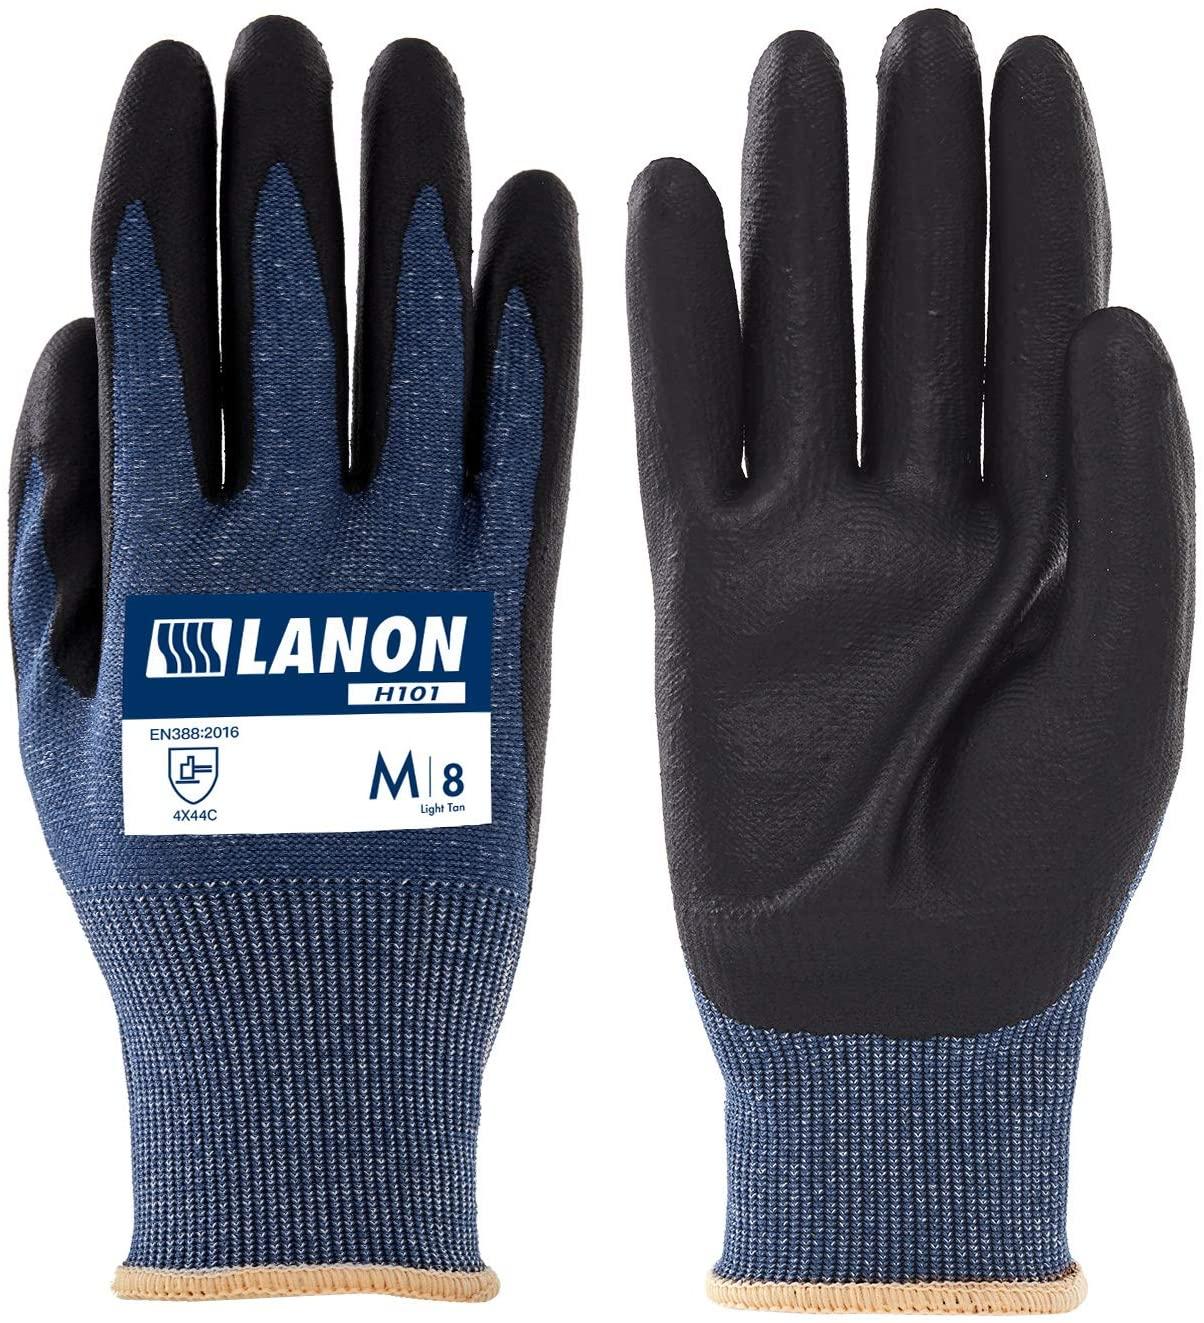 LANON Cut Resistant Gloves Level 5 with MicroFoam Nitrile Coated Palm, Garden Grip Safety Work Gloves, 13 Gauge, Non-Slip, Medium